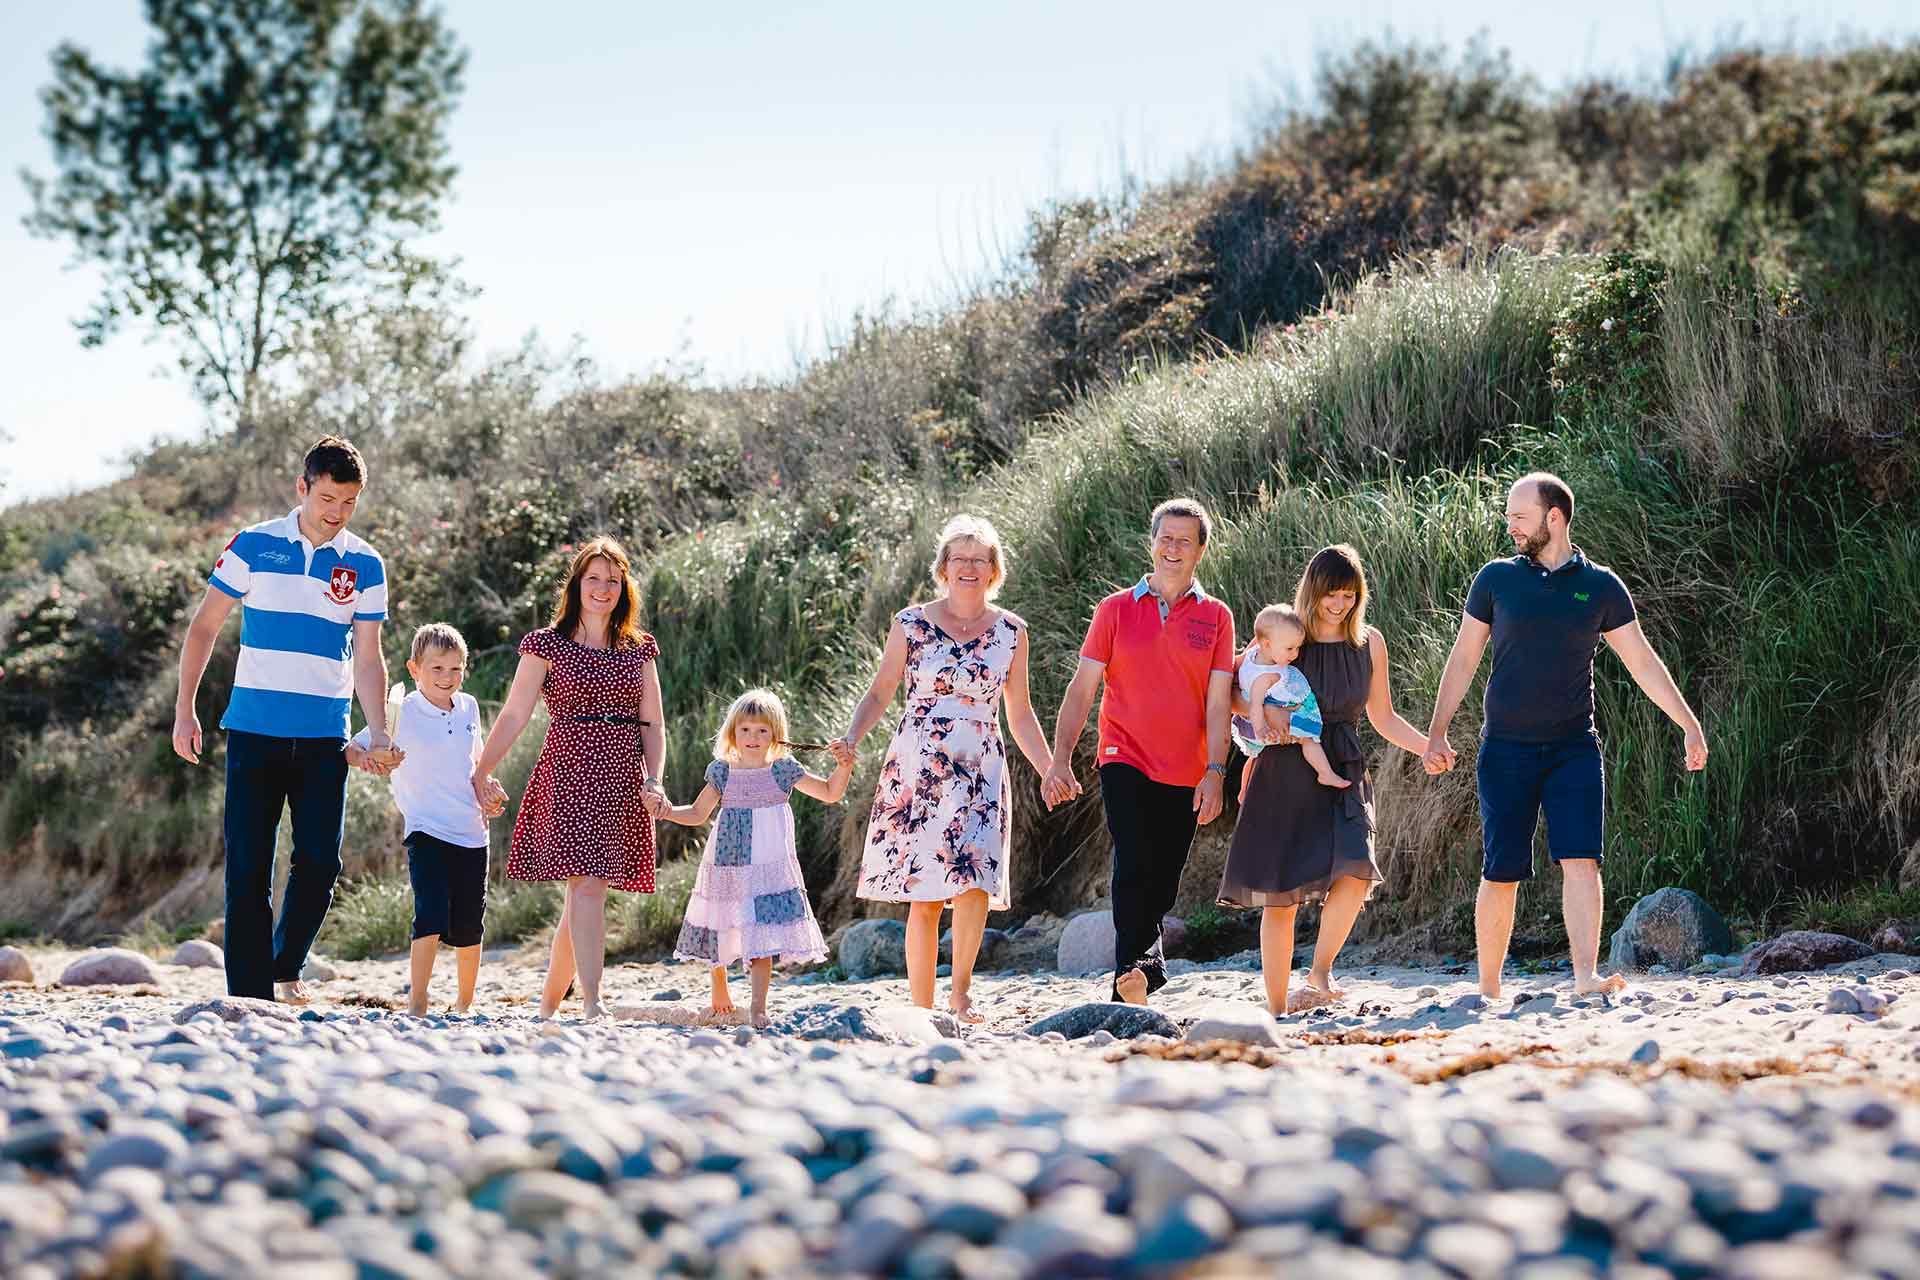 drei-Generationen-neun-Menschen-gehen-Hand-in-Hand-am-Strand-Shooting-am-Strand-Familienfotografie-Fotograf-Rostock - Familienshooting